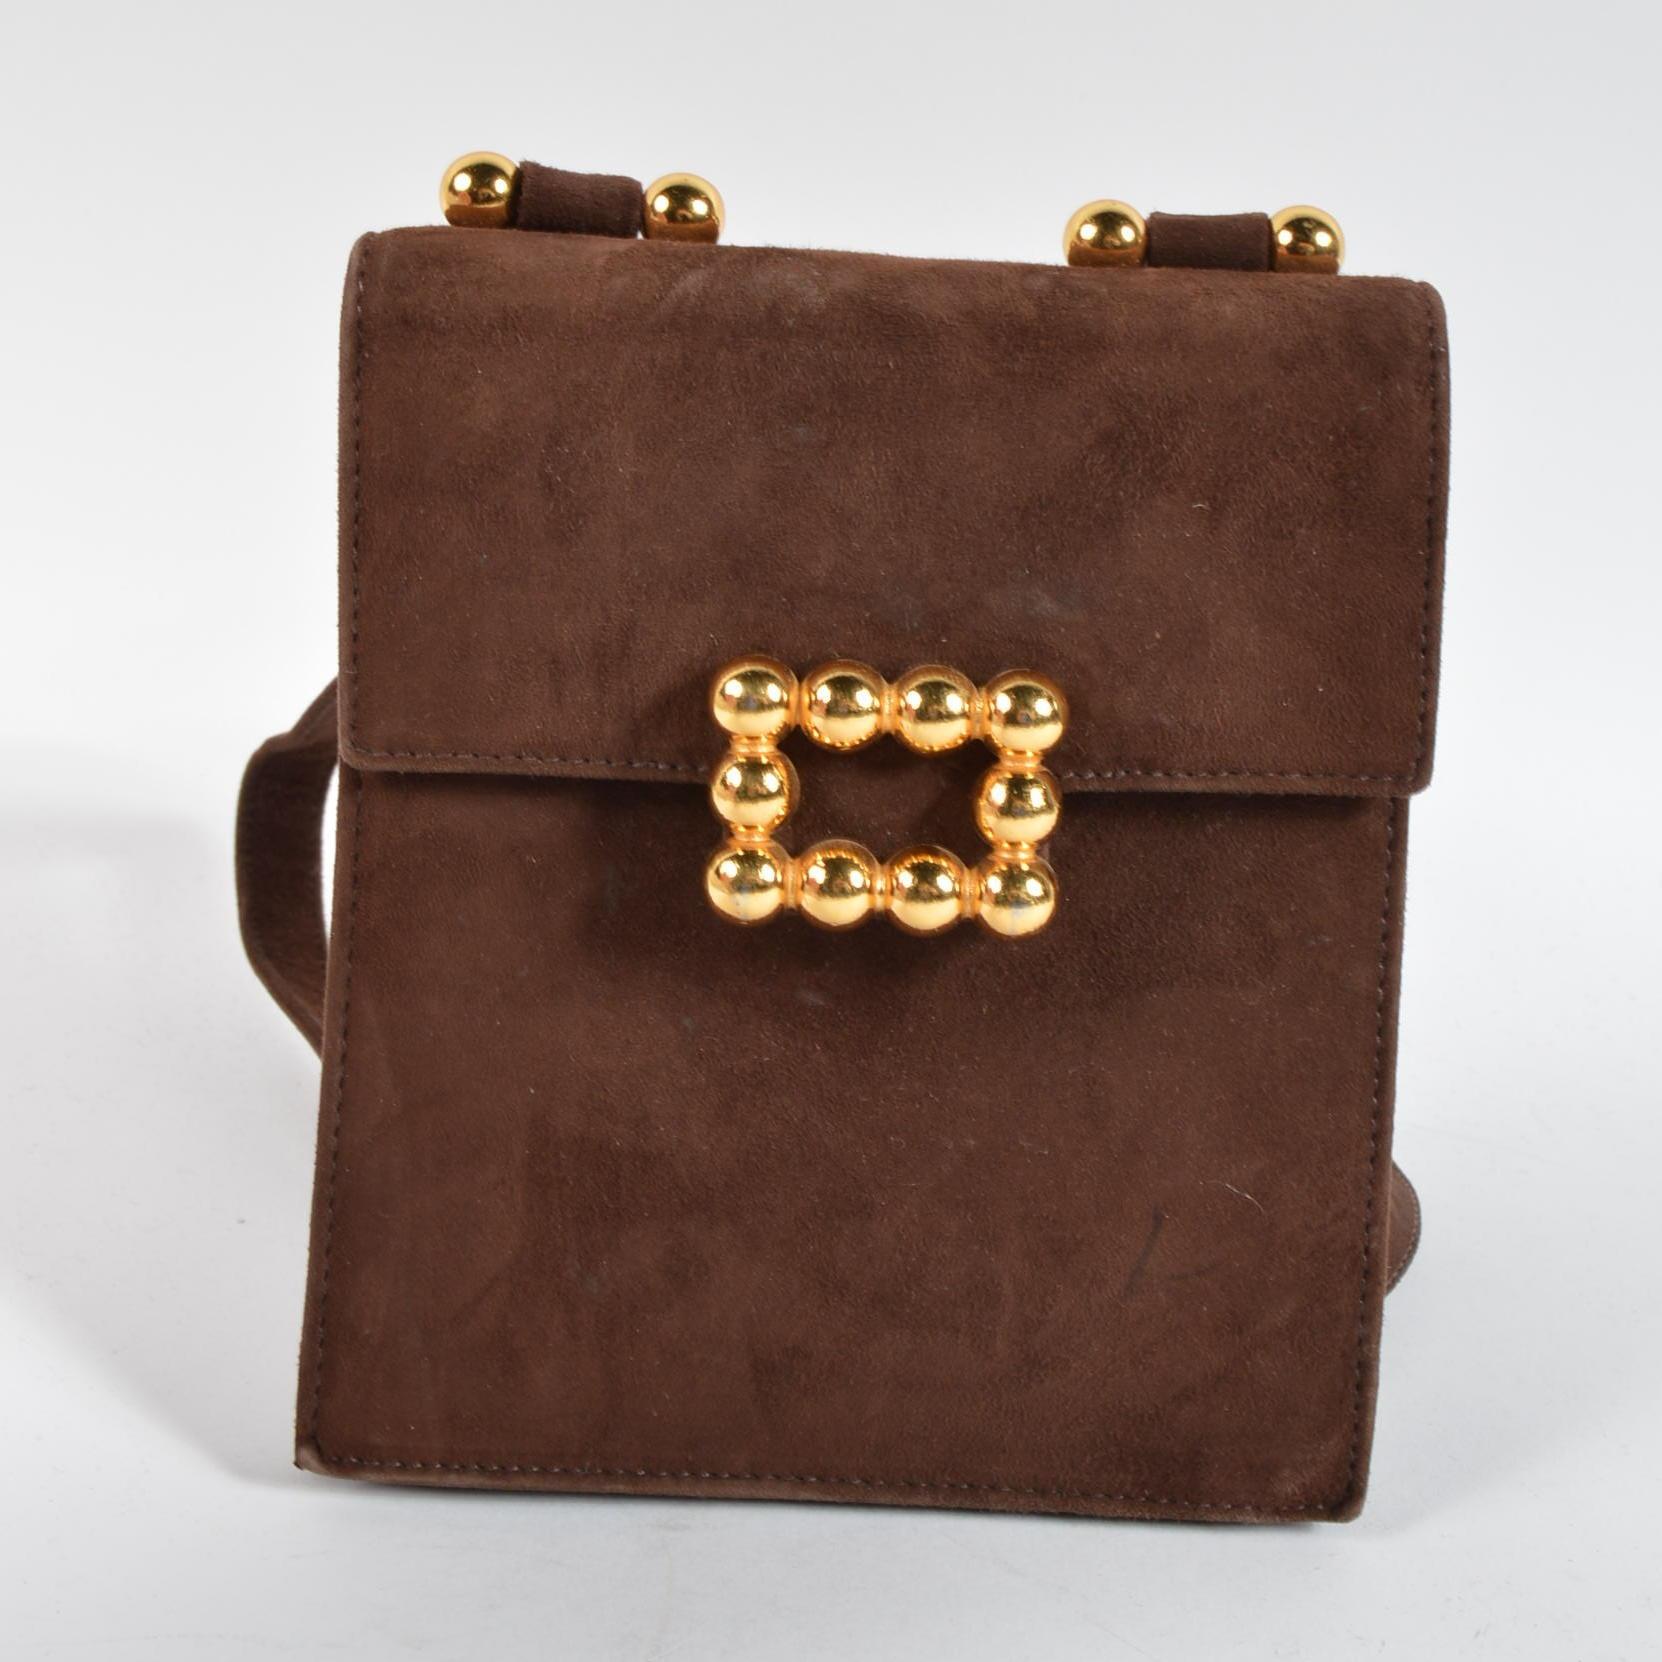 Vintage Paloma Picasso Brown Leather Handbag